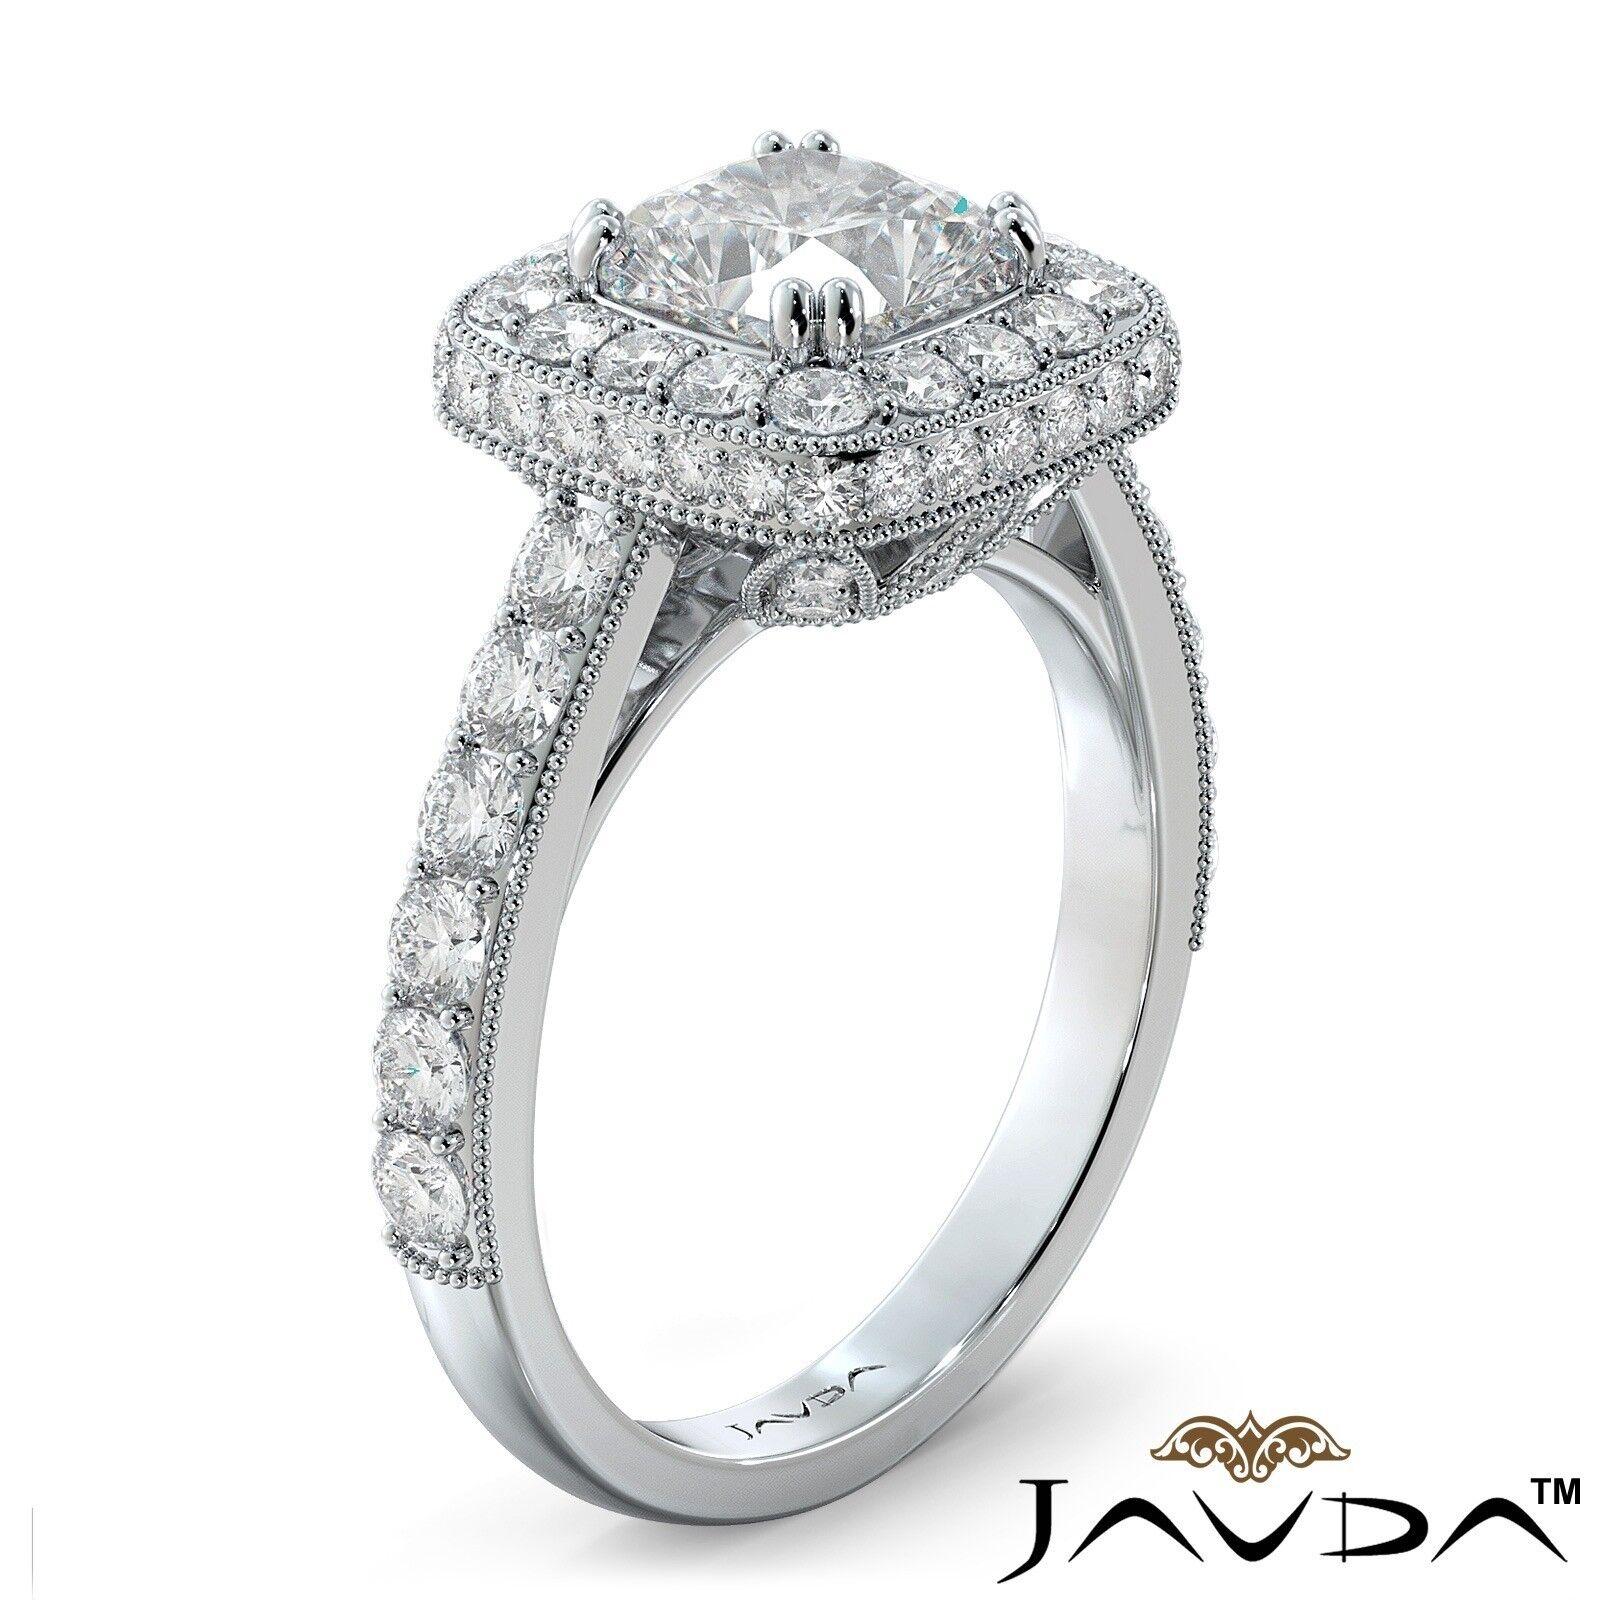 1.94ctw Milgrain Floral Basket Cushion Diamond Engagement Ring GIA E-VVS1 W Gold 1